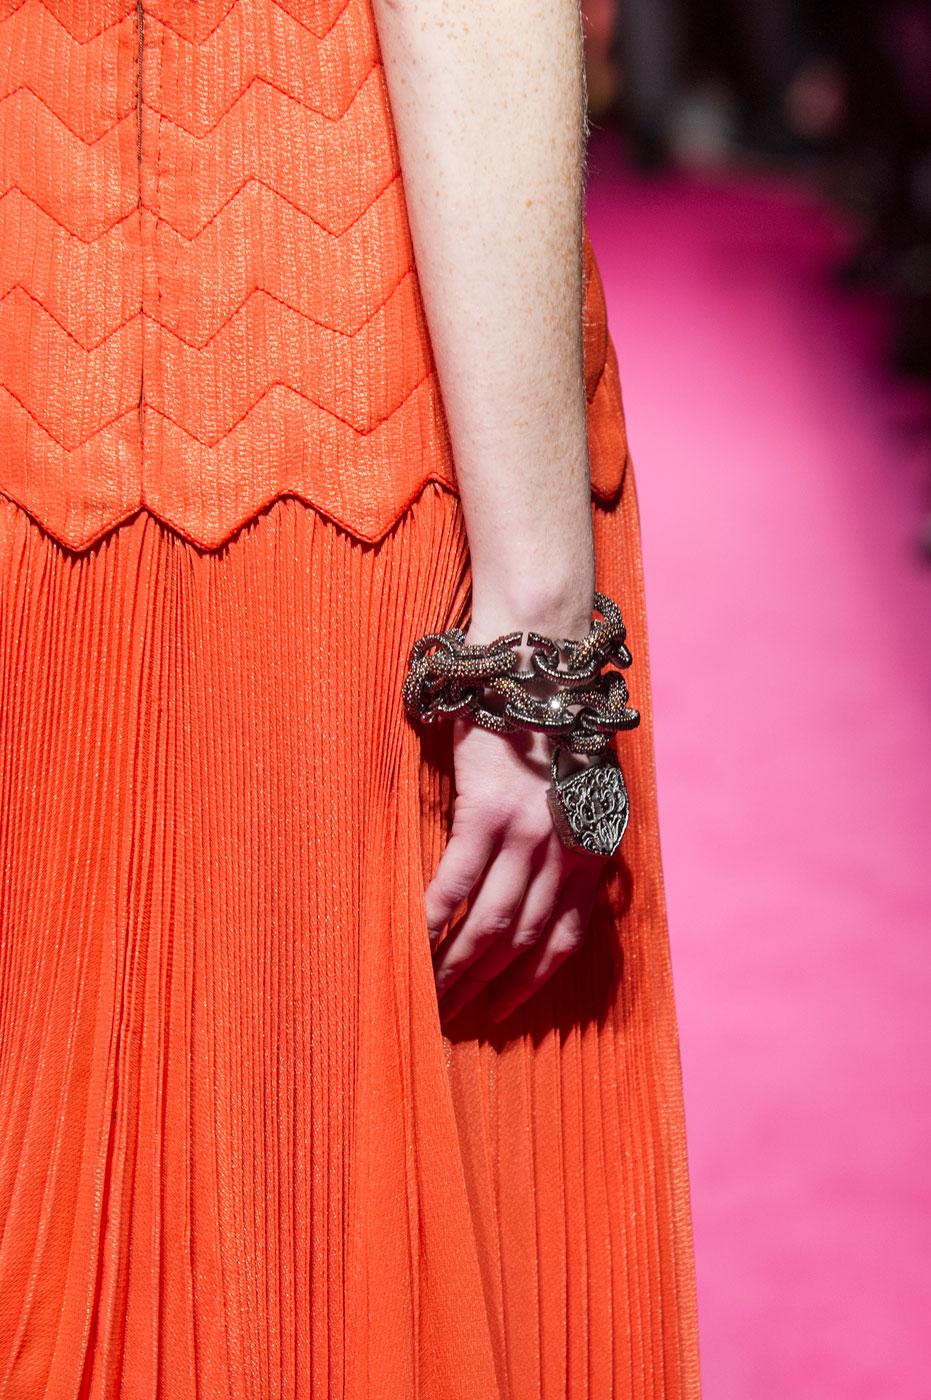 Schiaparelli-fashion-runway-show-close-ups-haute-couture-paris-spring-summer-2015-the-impression-53